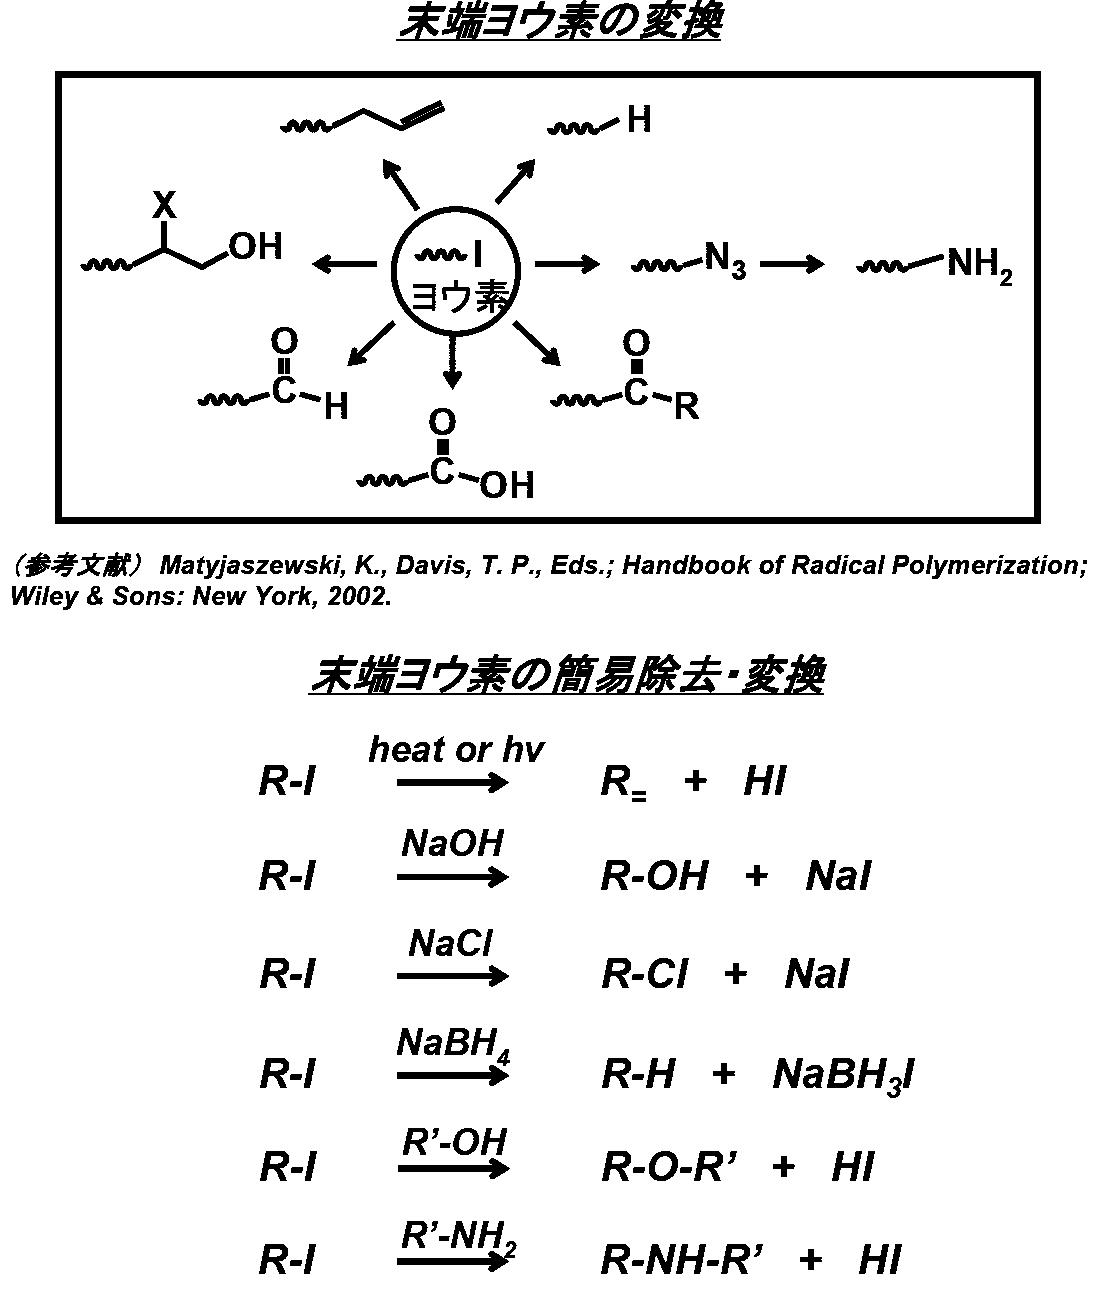 WO2013027419A1 - リビングラジカル重合触媒および重合方法         - Google PatentsFamily